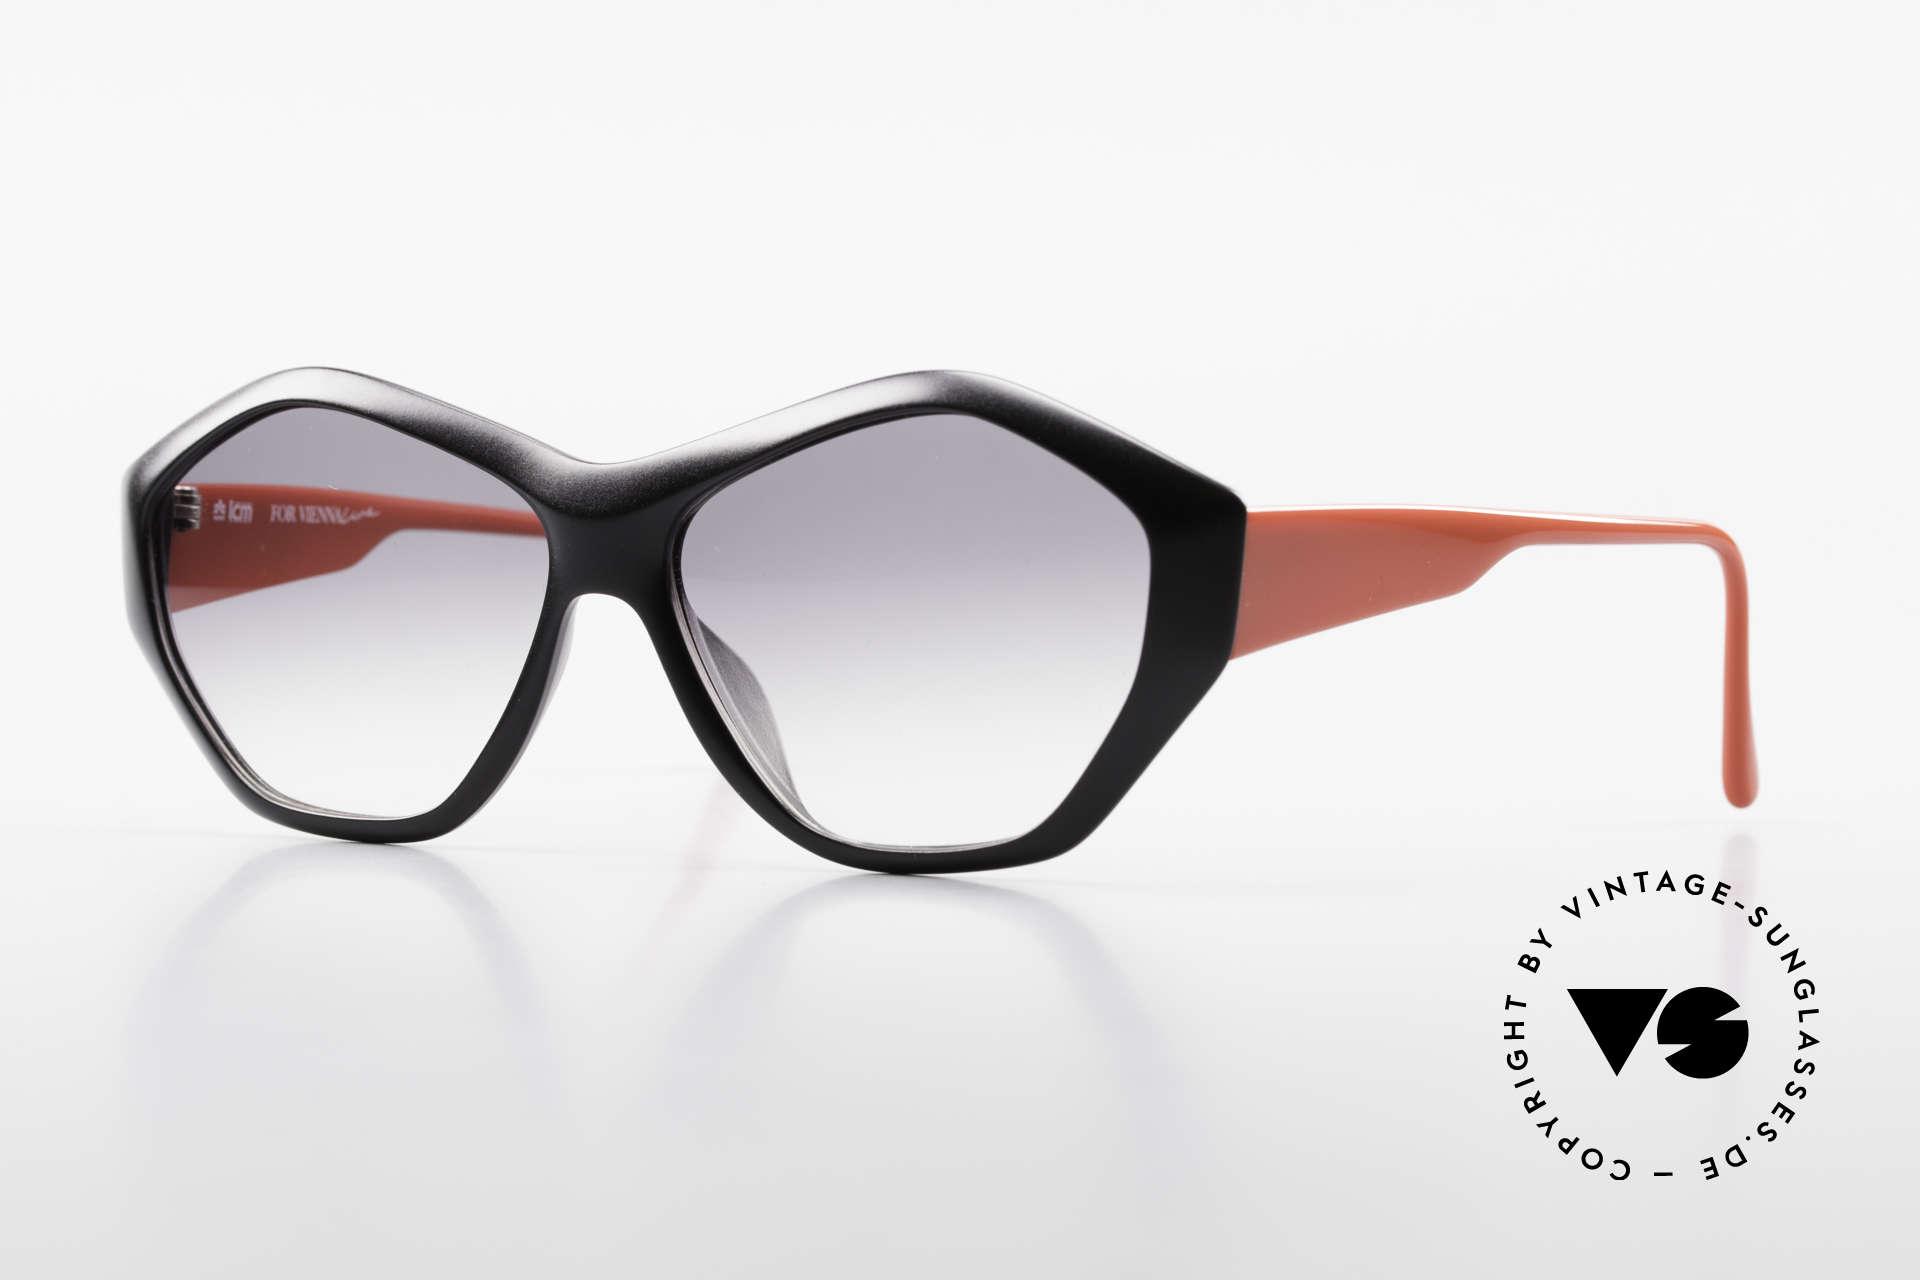 Paloma Picasso 1463 Ladies Sunglasses 90's Optyl, vintage ladies sunglasses by P. PICASSO from 1990, Made for Women